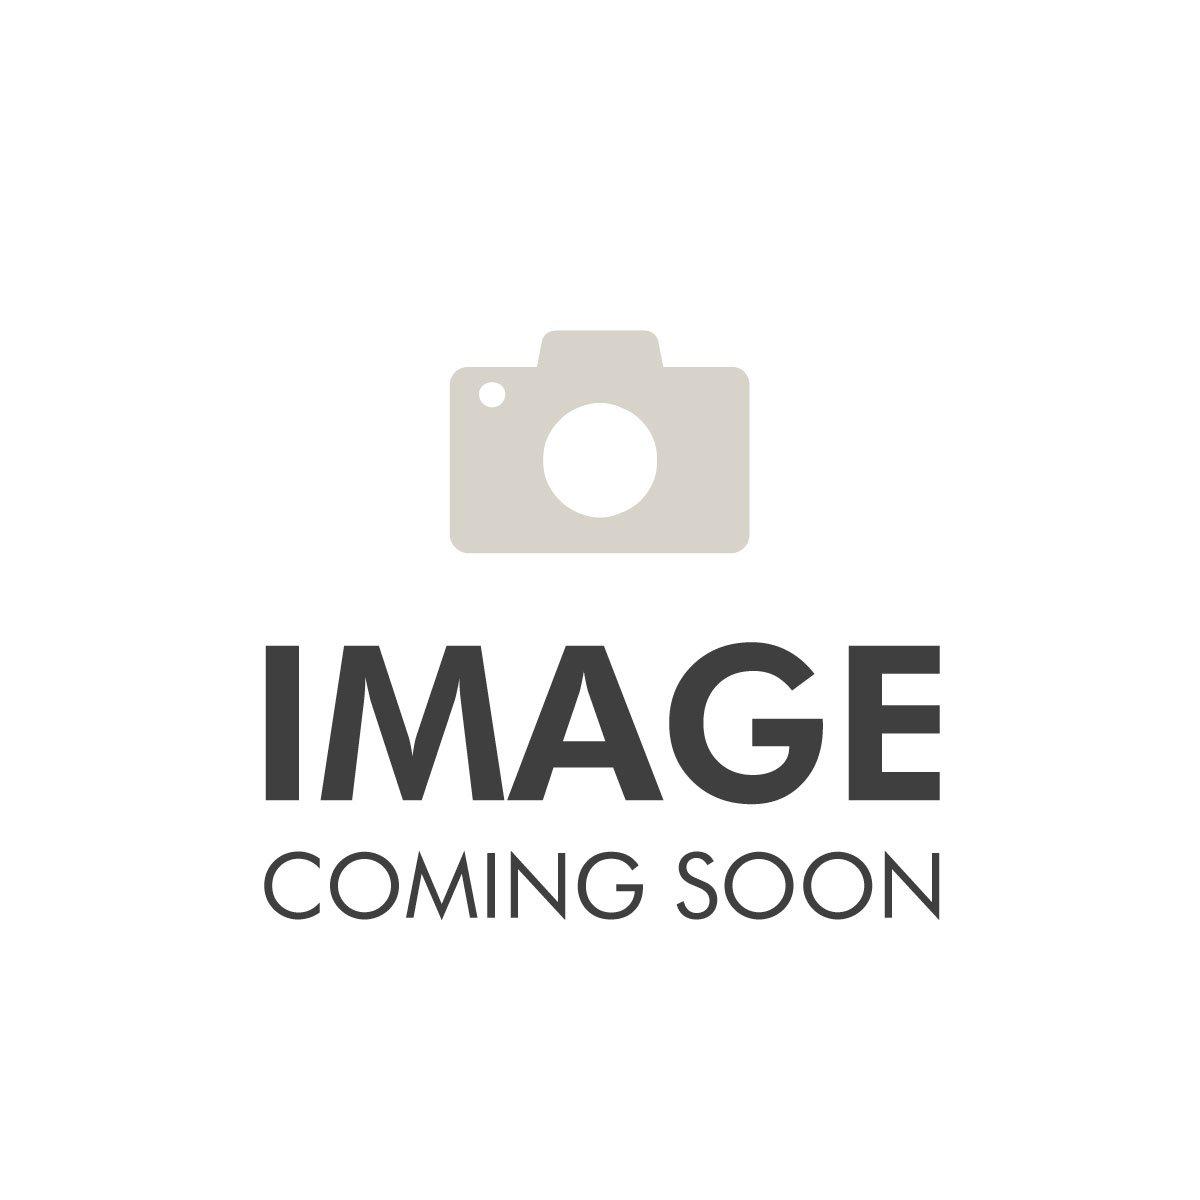 L'Oreal Loreal Professionnel Pro Fiber Rectify Hair Mask 200ml